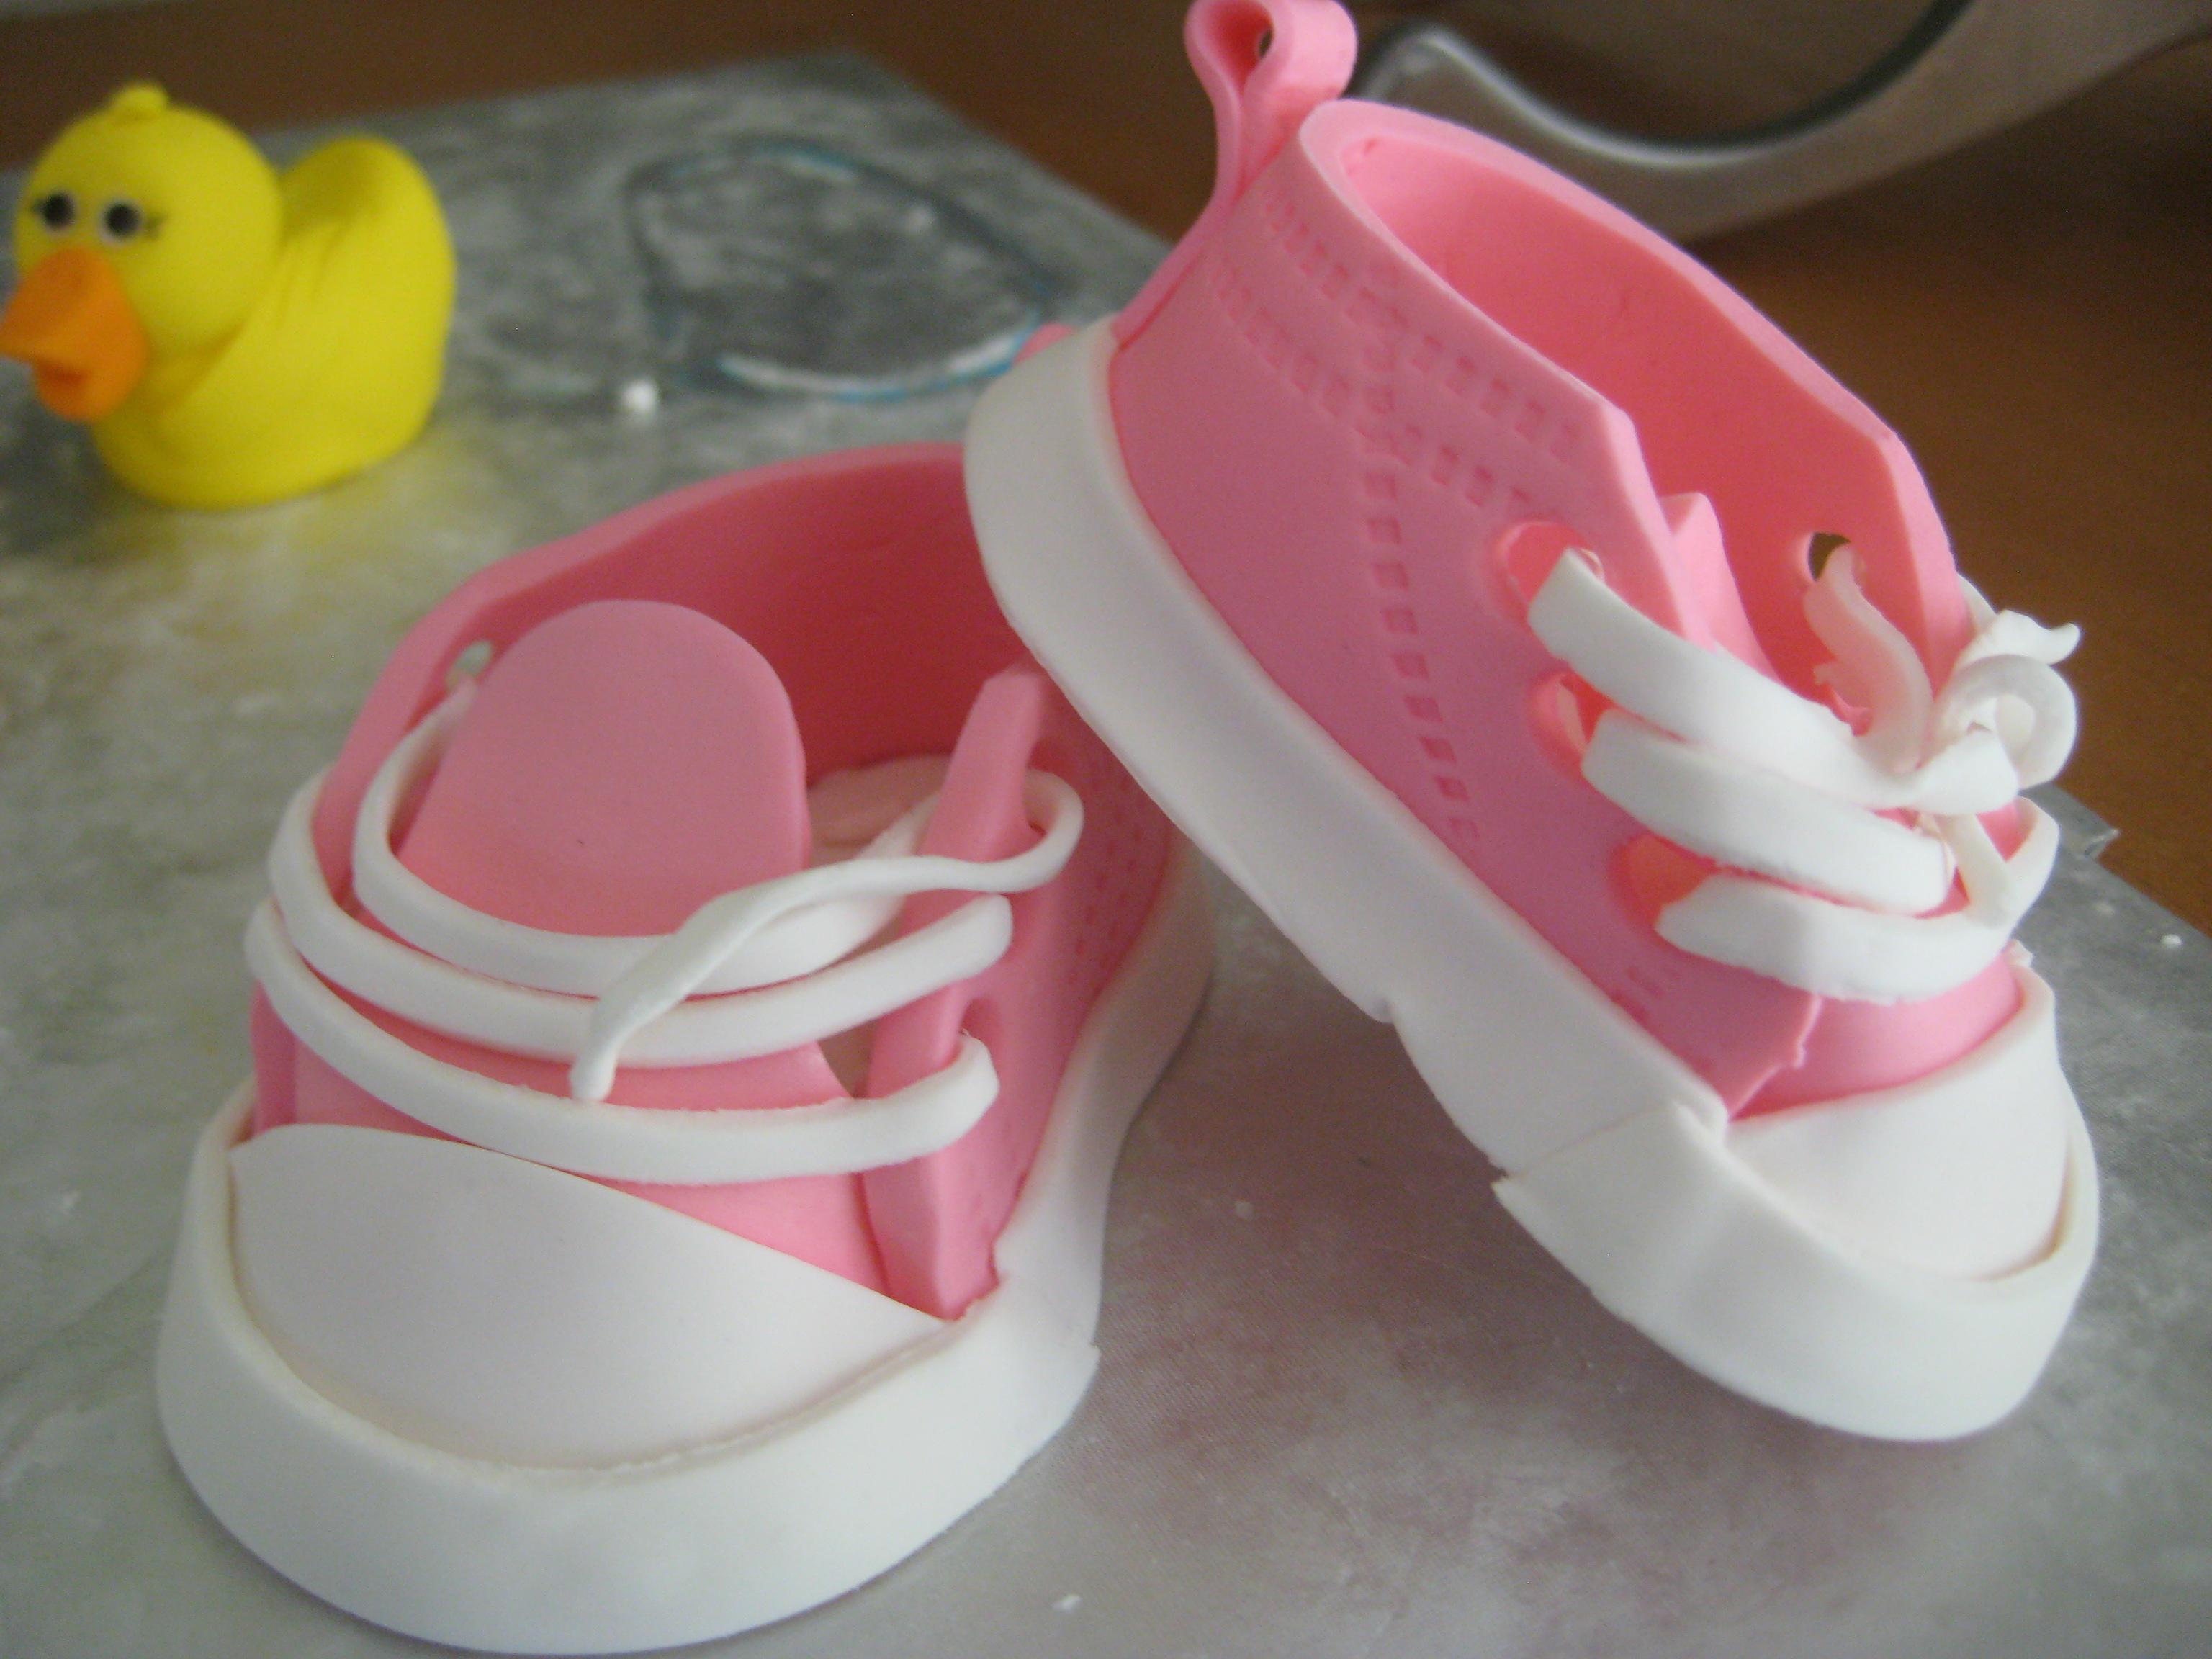 df1f8423c56b Baby Fondant Shoe Template. www cakecentral com tutorial 22305 ...